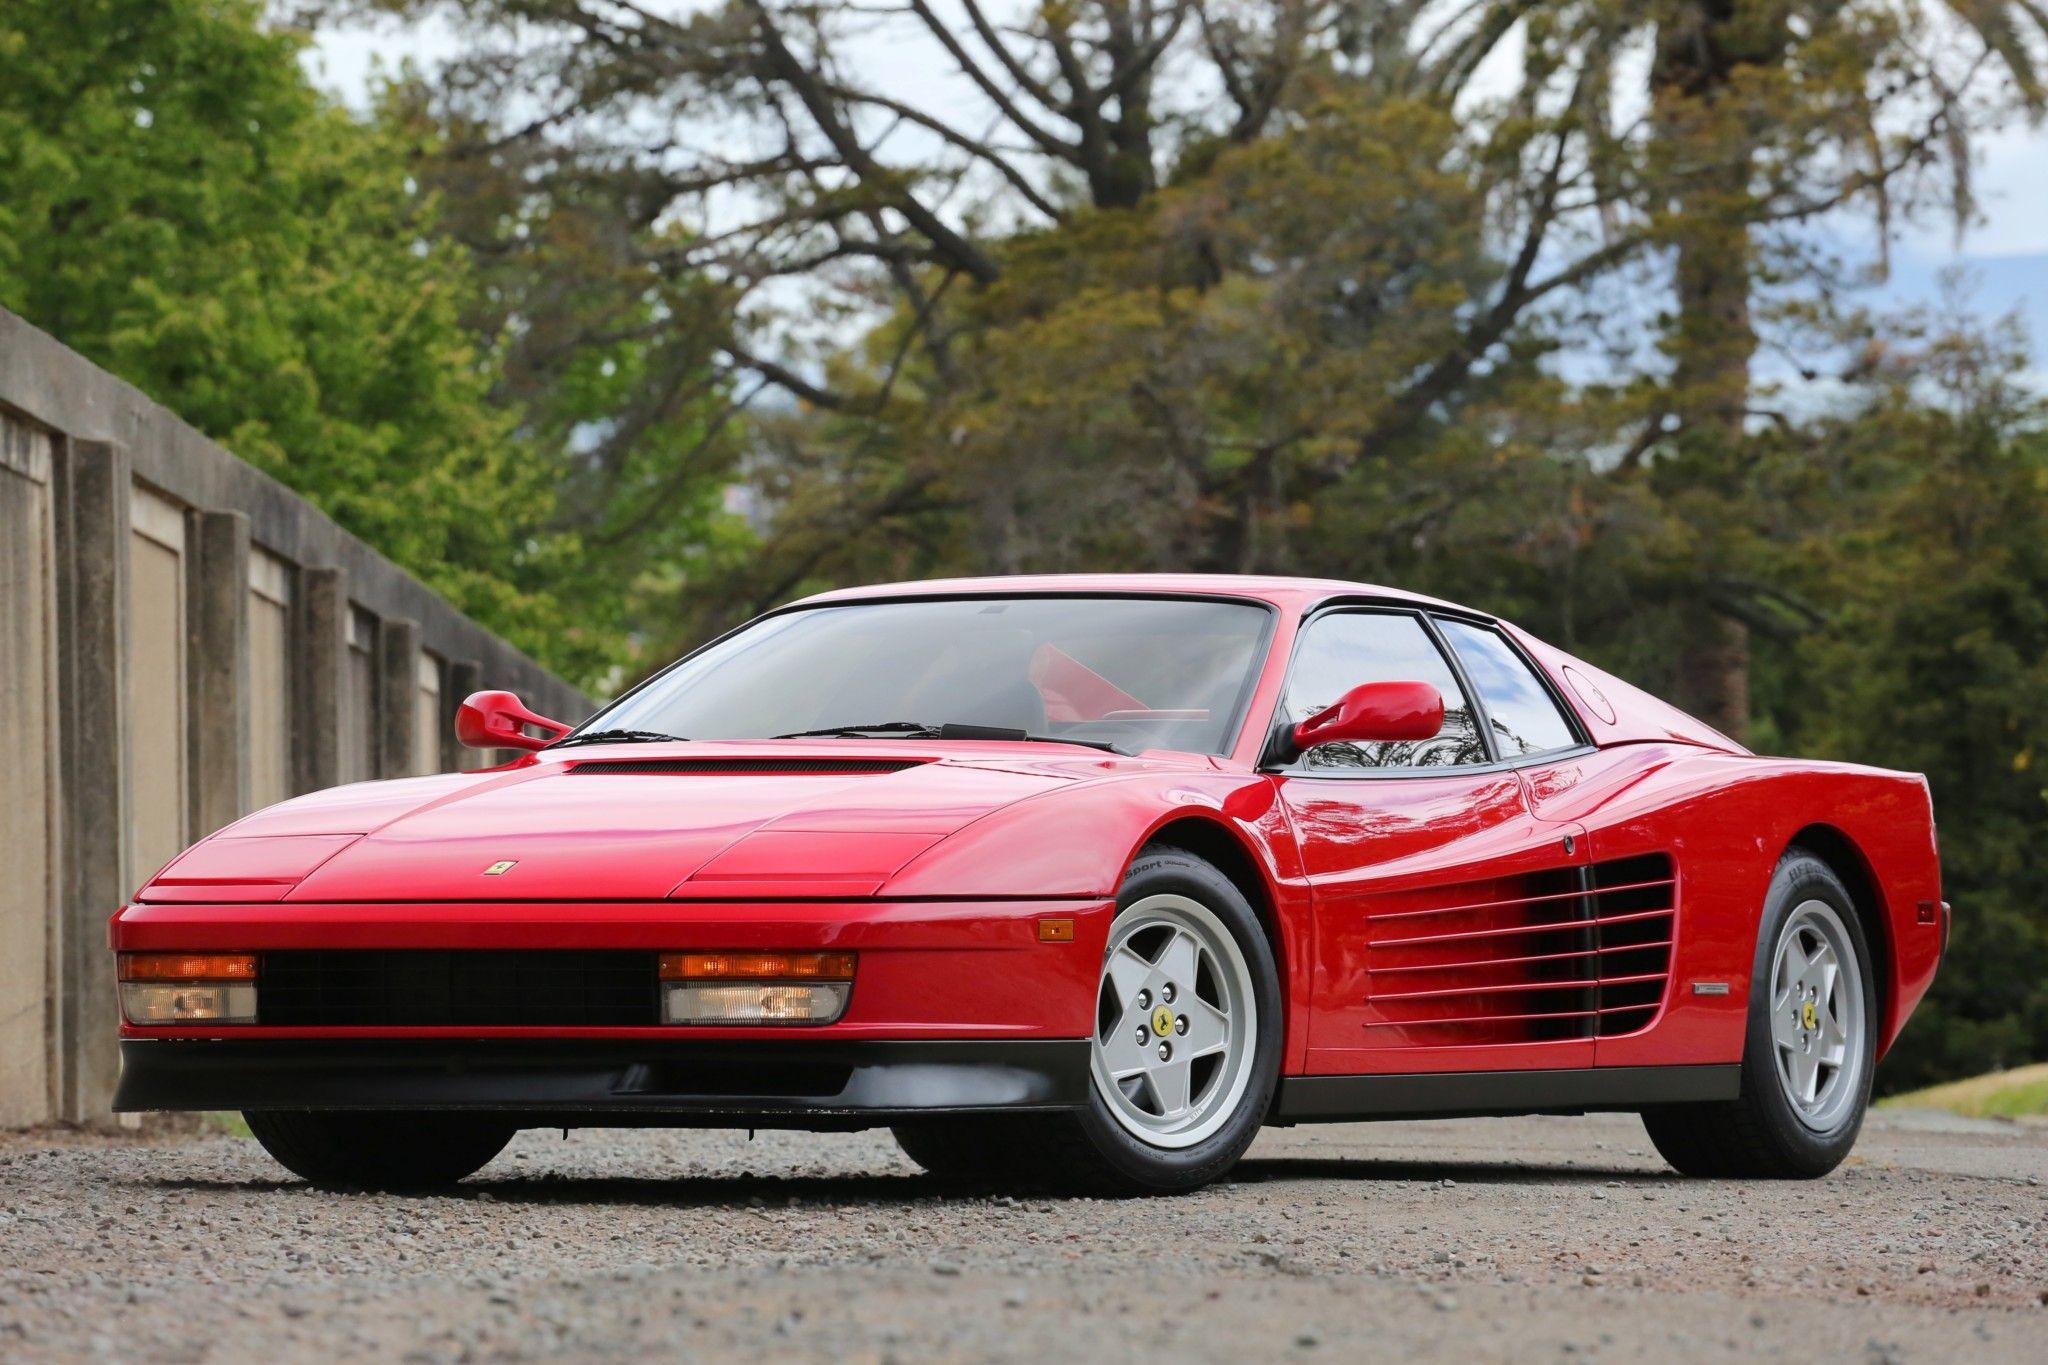 1990 Ferrari Testarossa Ferrari Testarossa Ferrari Classic Cars